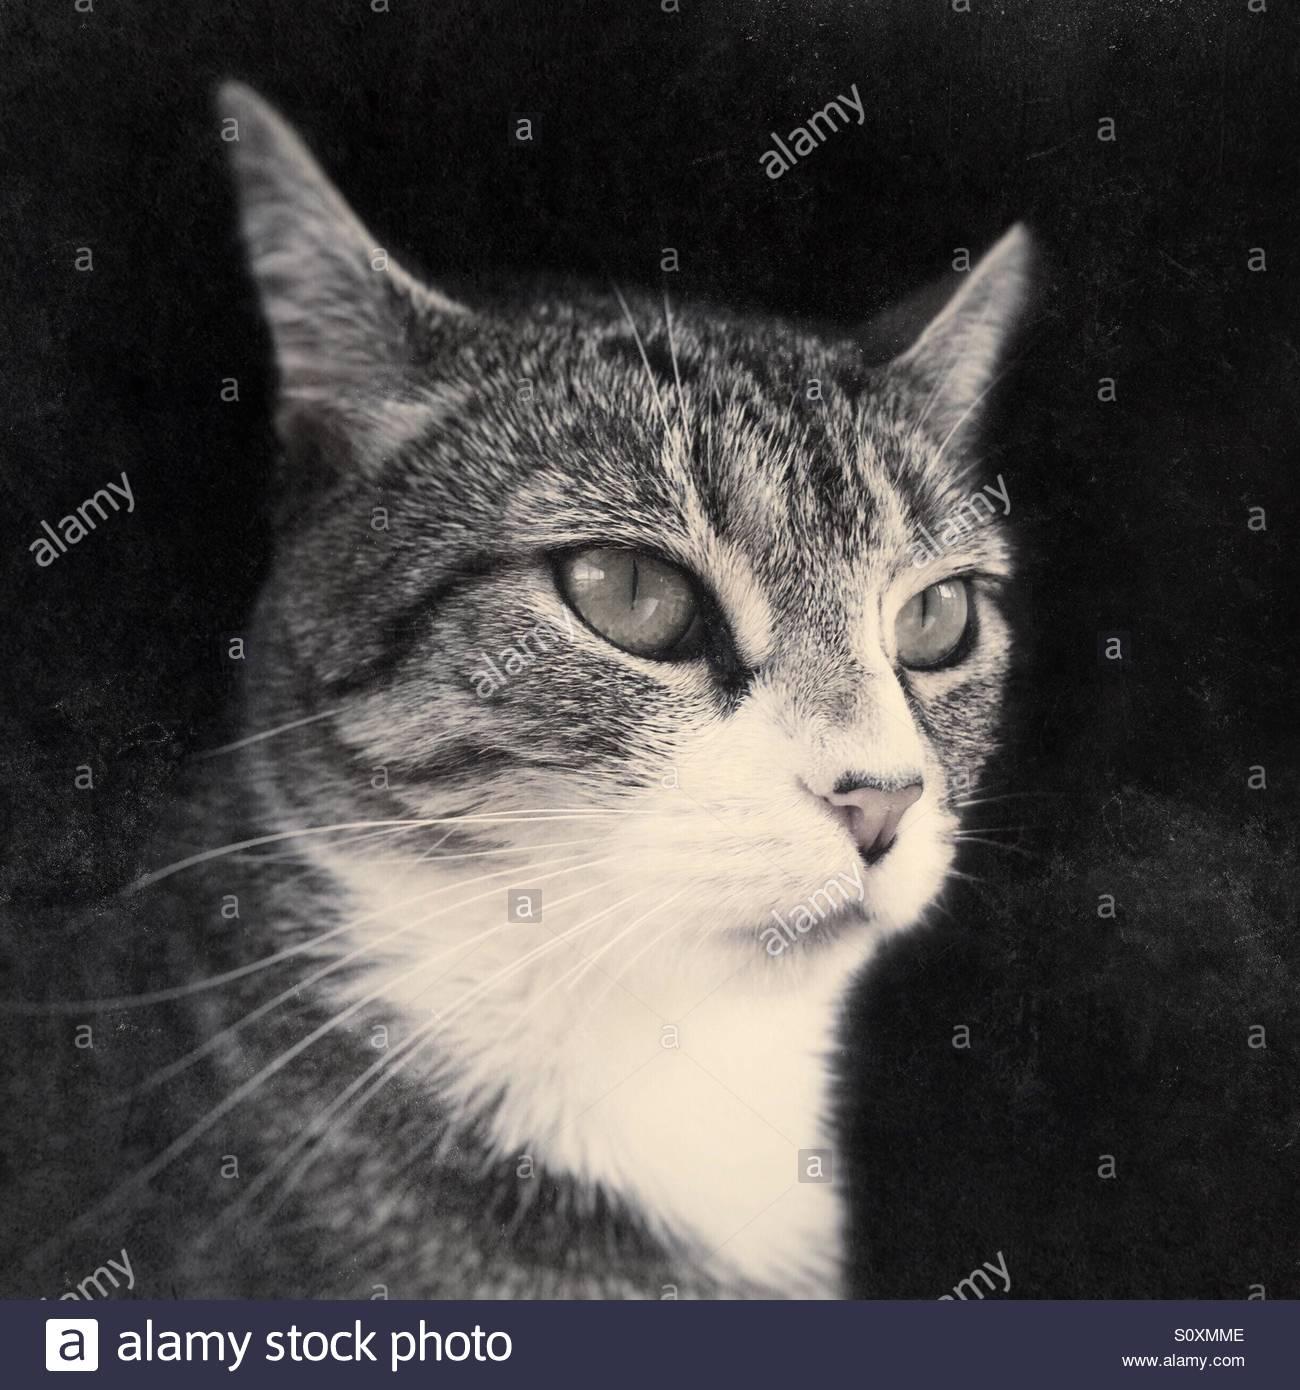 Monocromo Retrato Cat Imagen De Stock